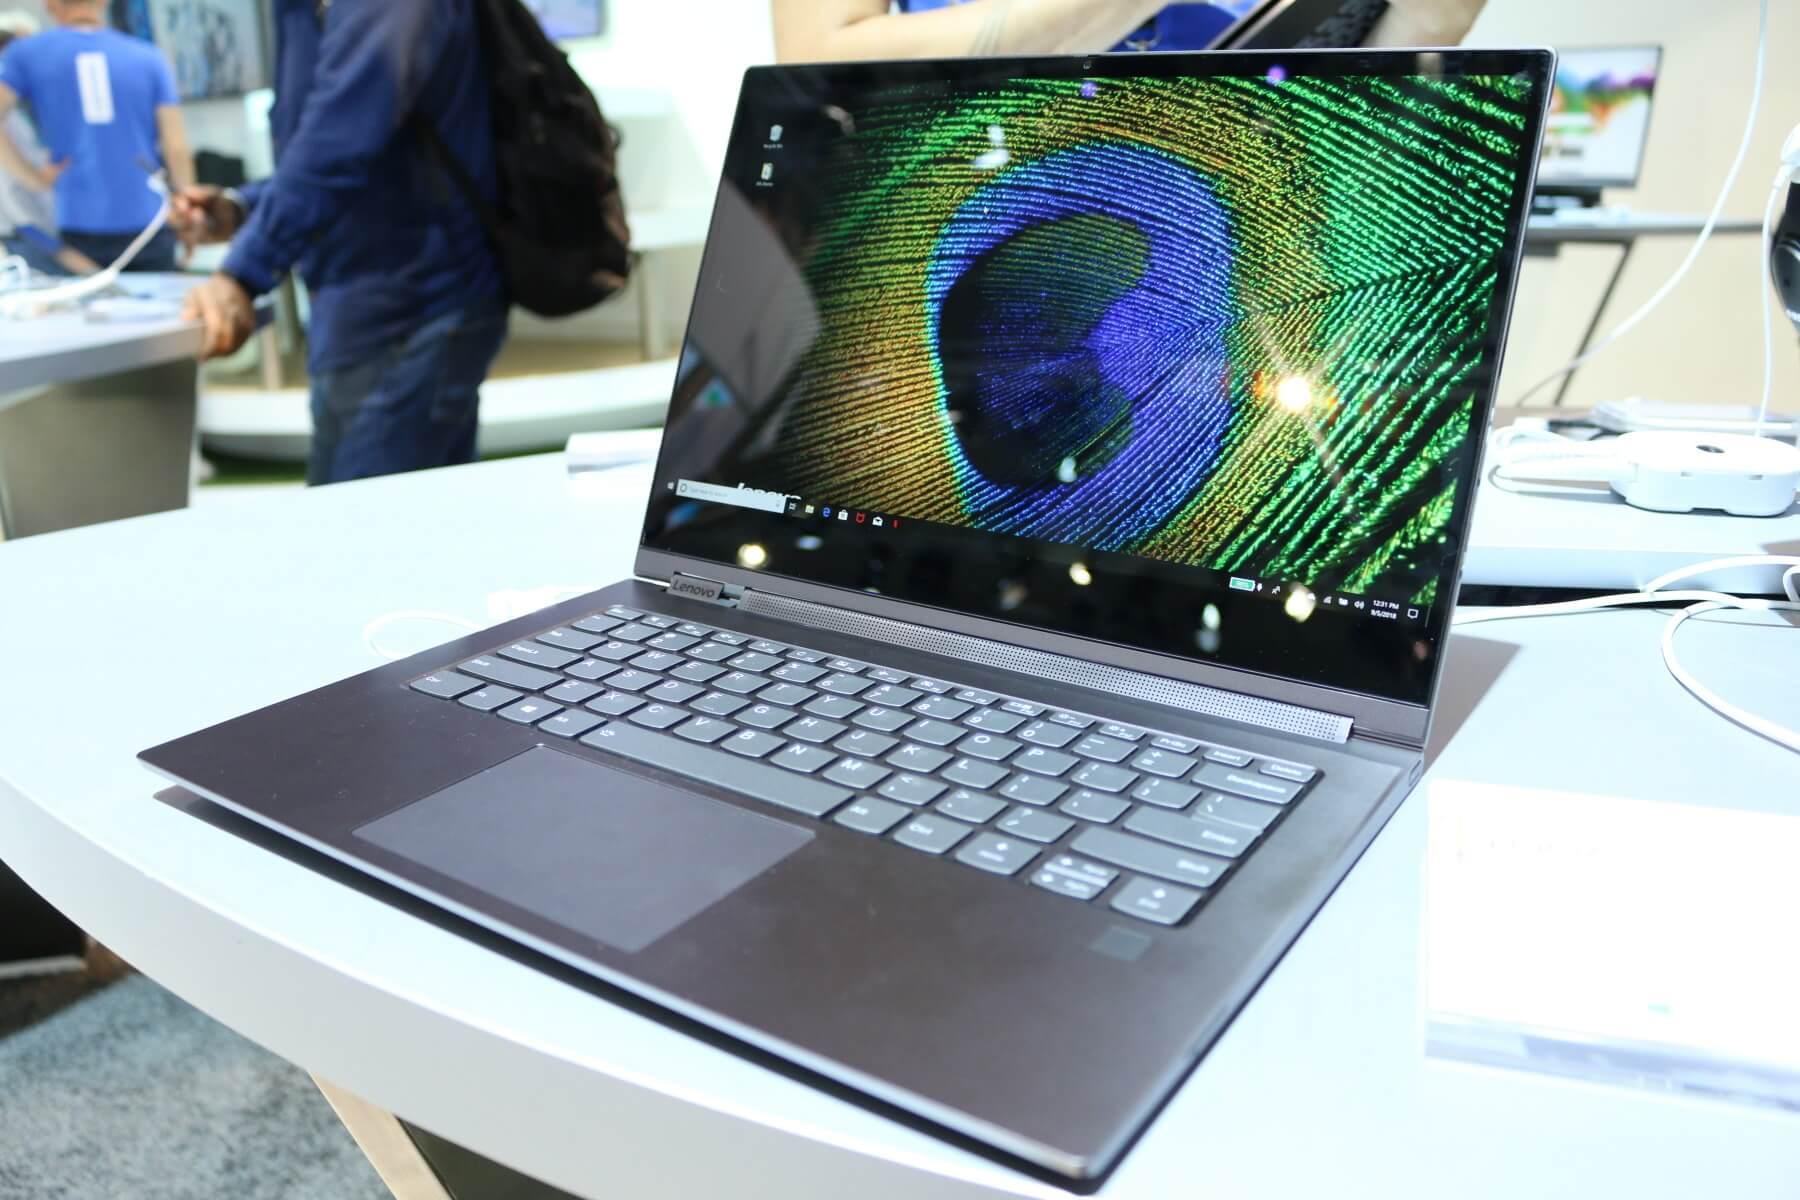 Lenovo Yoga C930 Im Hands On Bling Bling Notebook Mit 4k Display